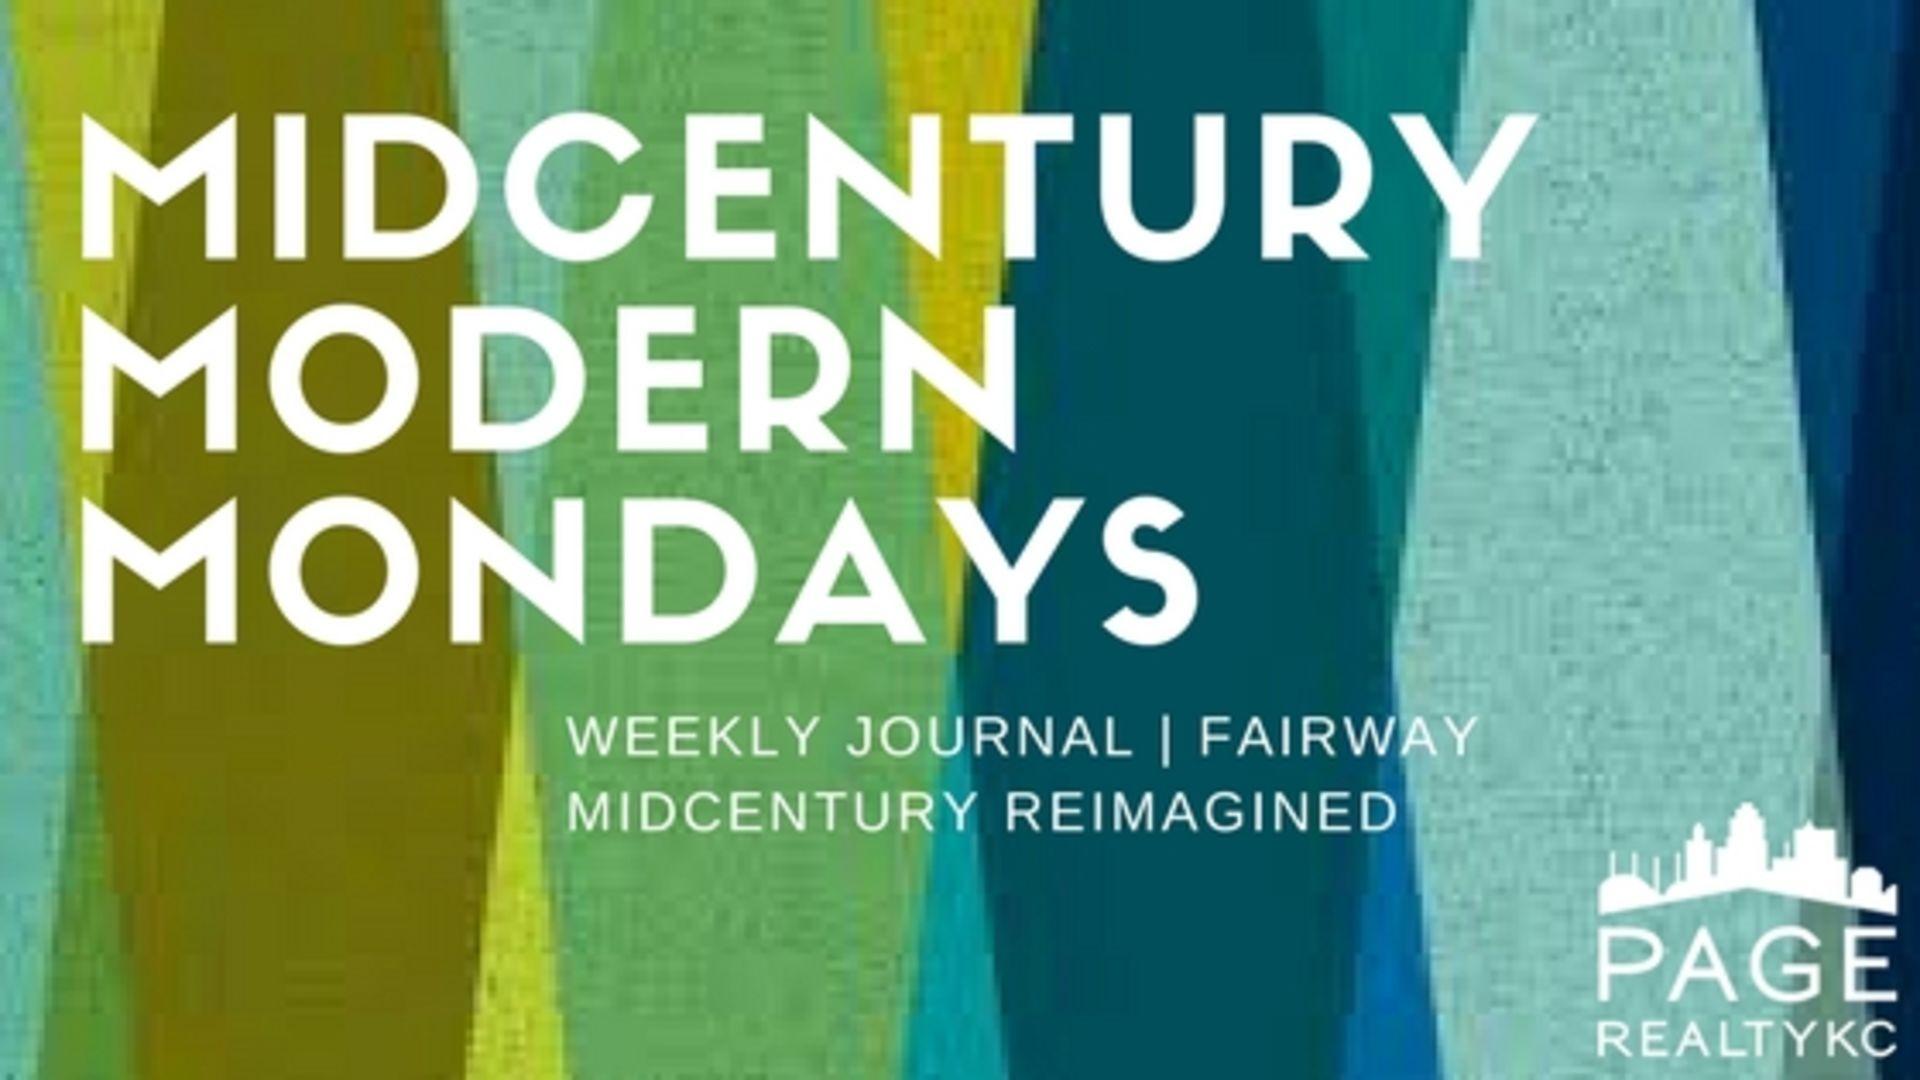 Midcentury Modern Monday – October 23rd